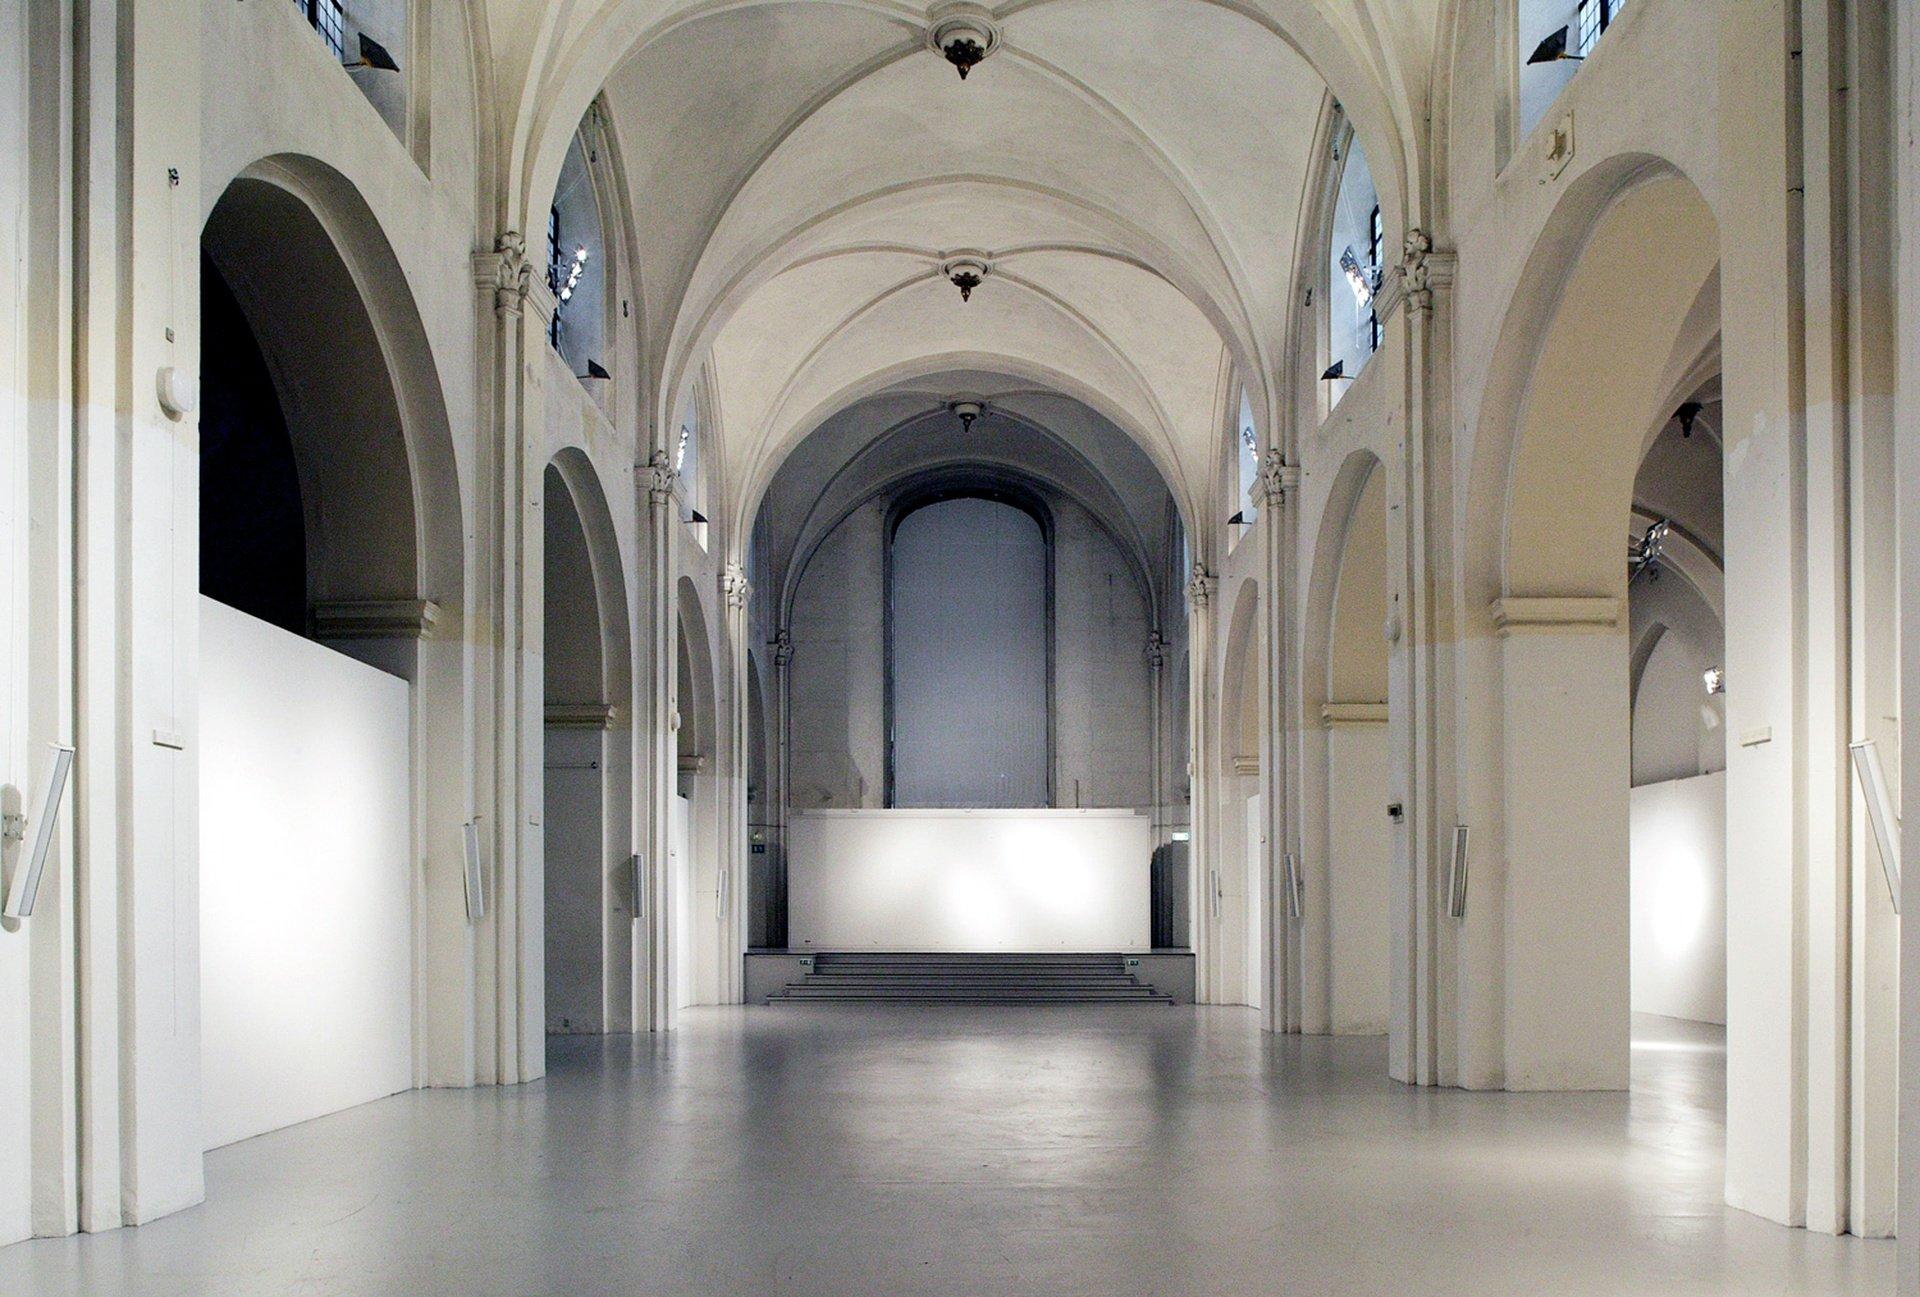 Copenhagen corporate event venues Gallery Nikolaj Kunsthal - Lower Gallery image 0